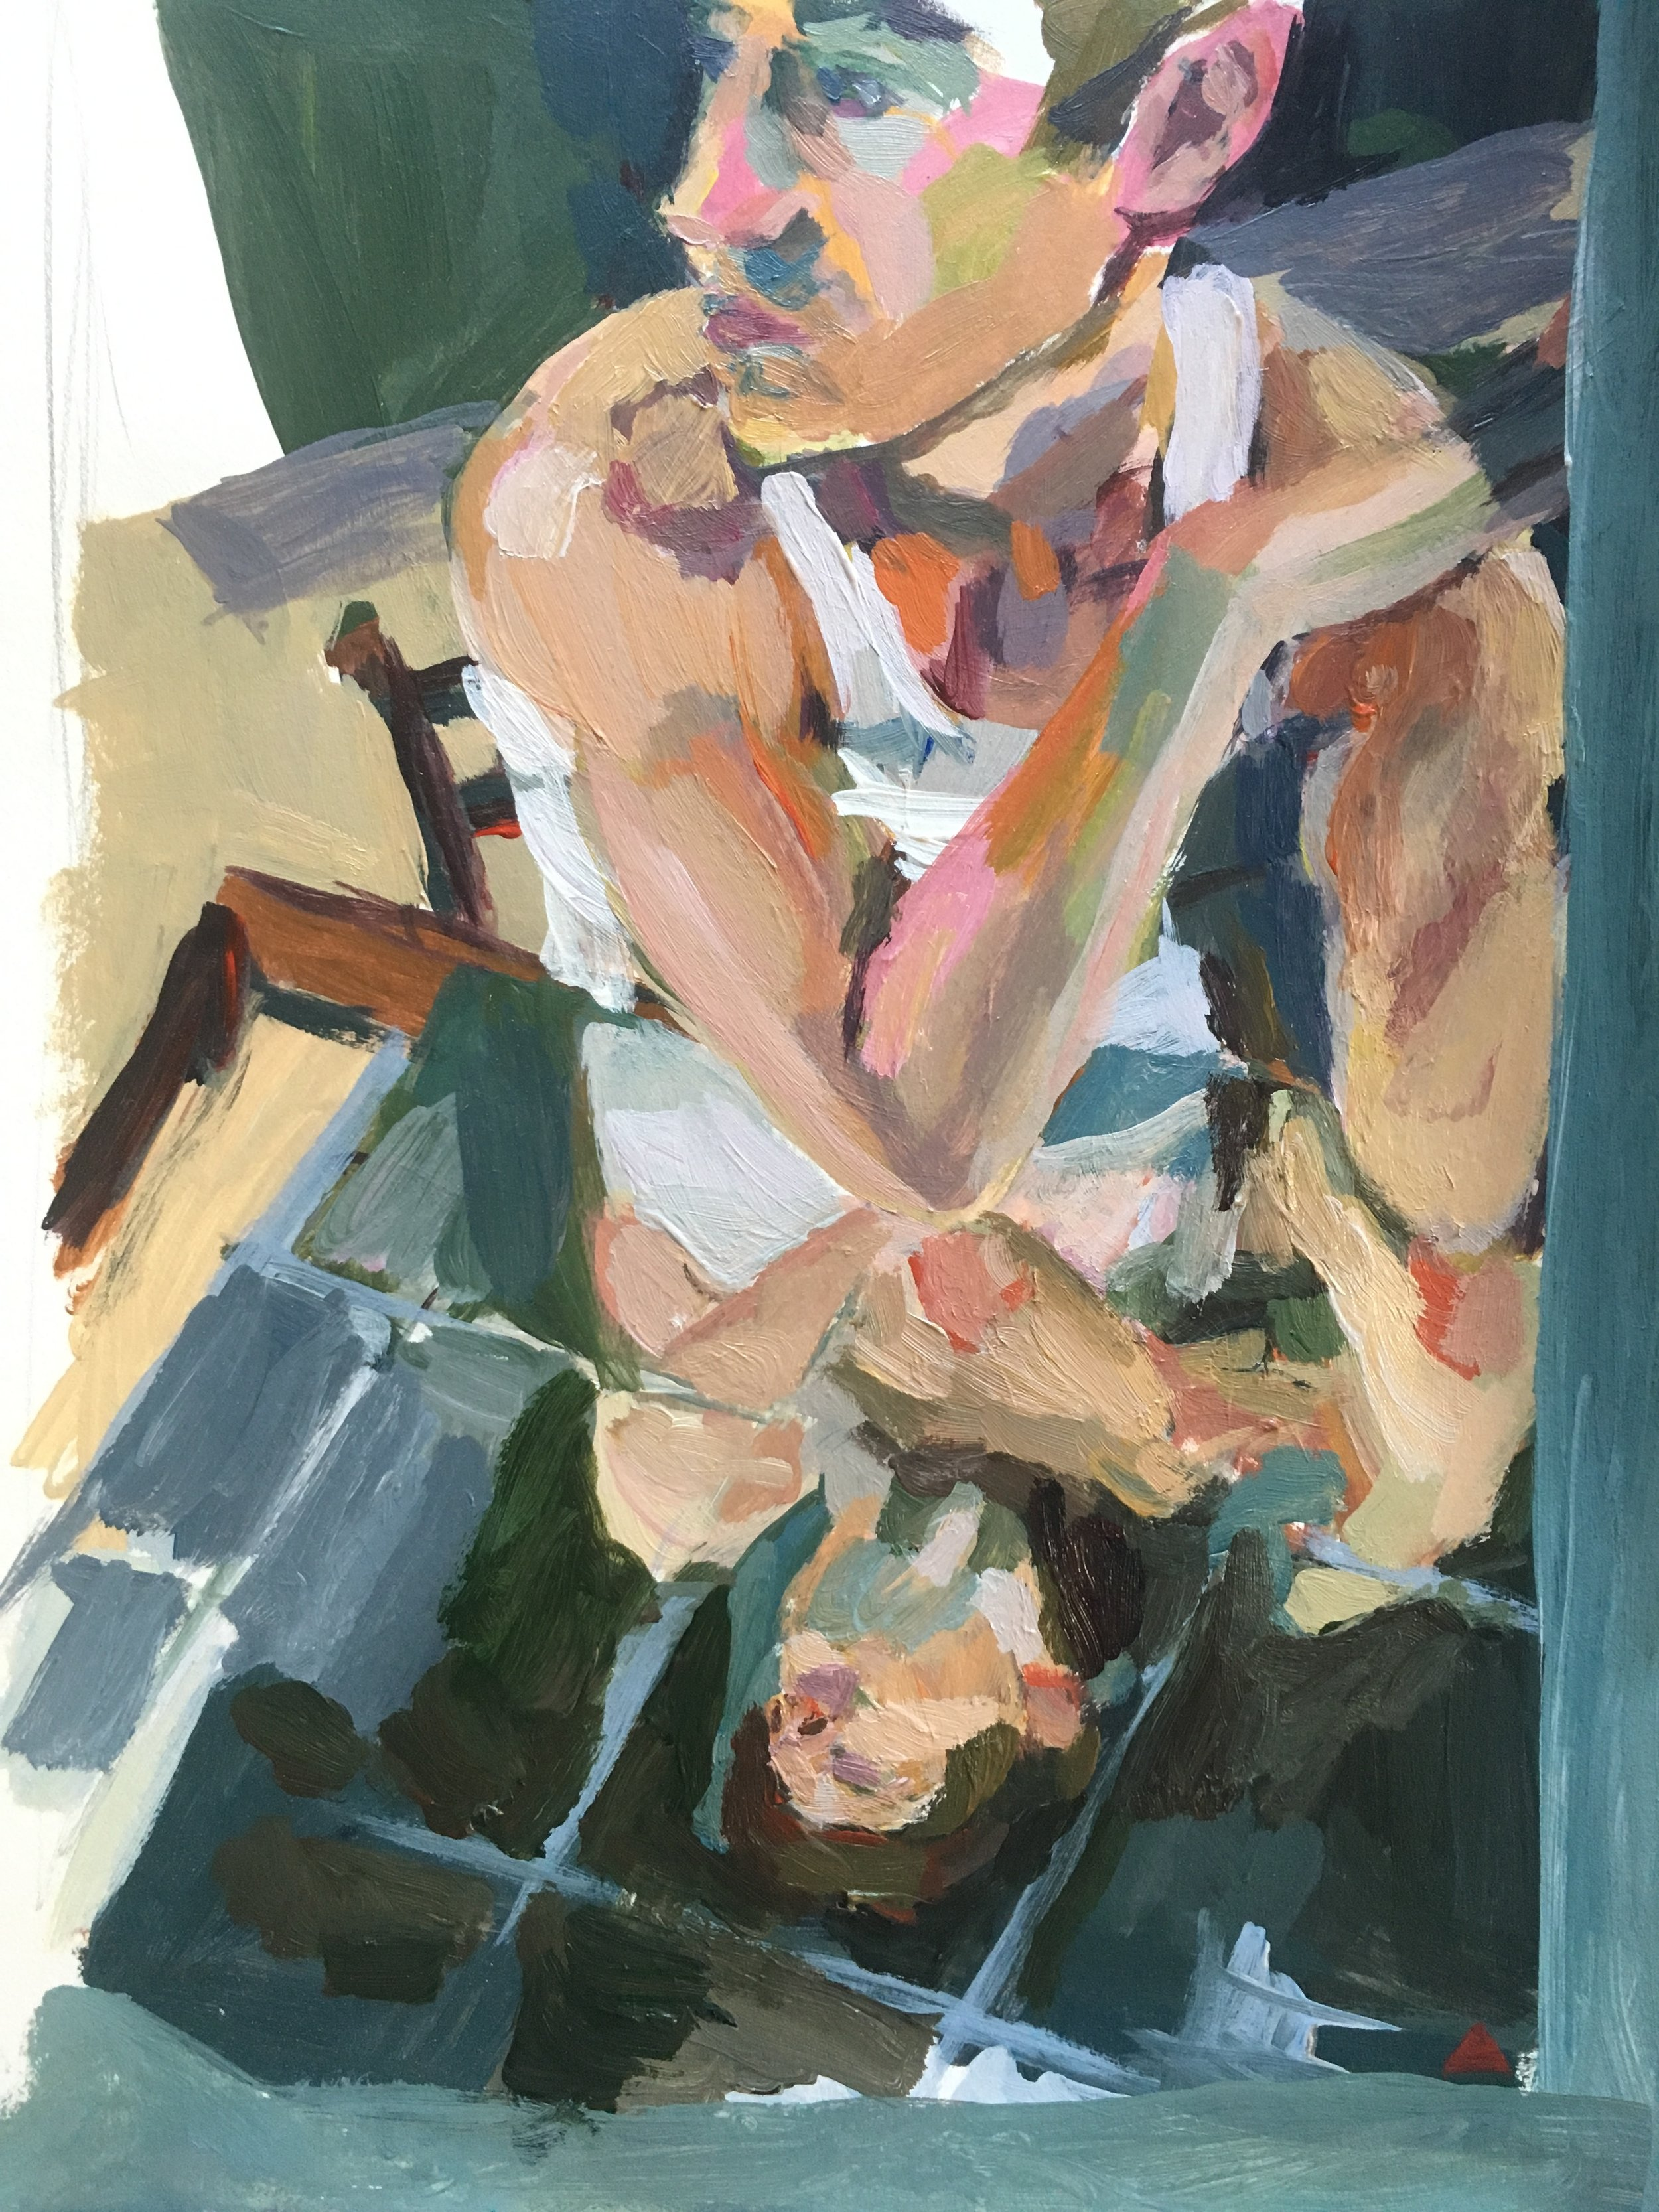 Dan Reflection Paintin.JPG